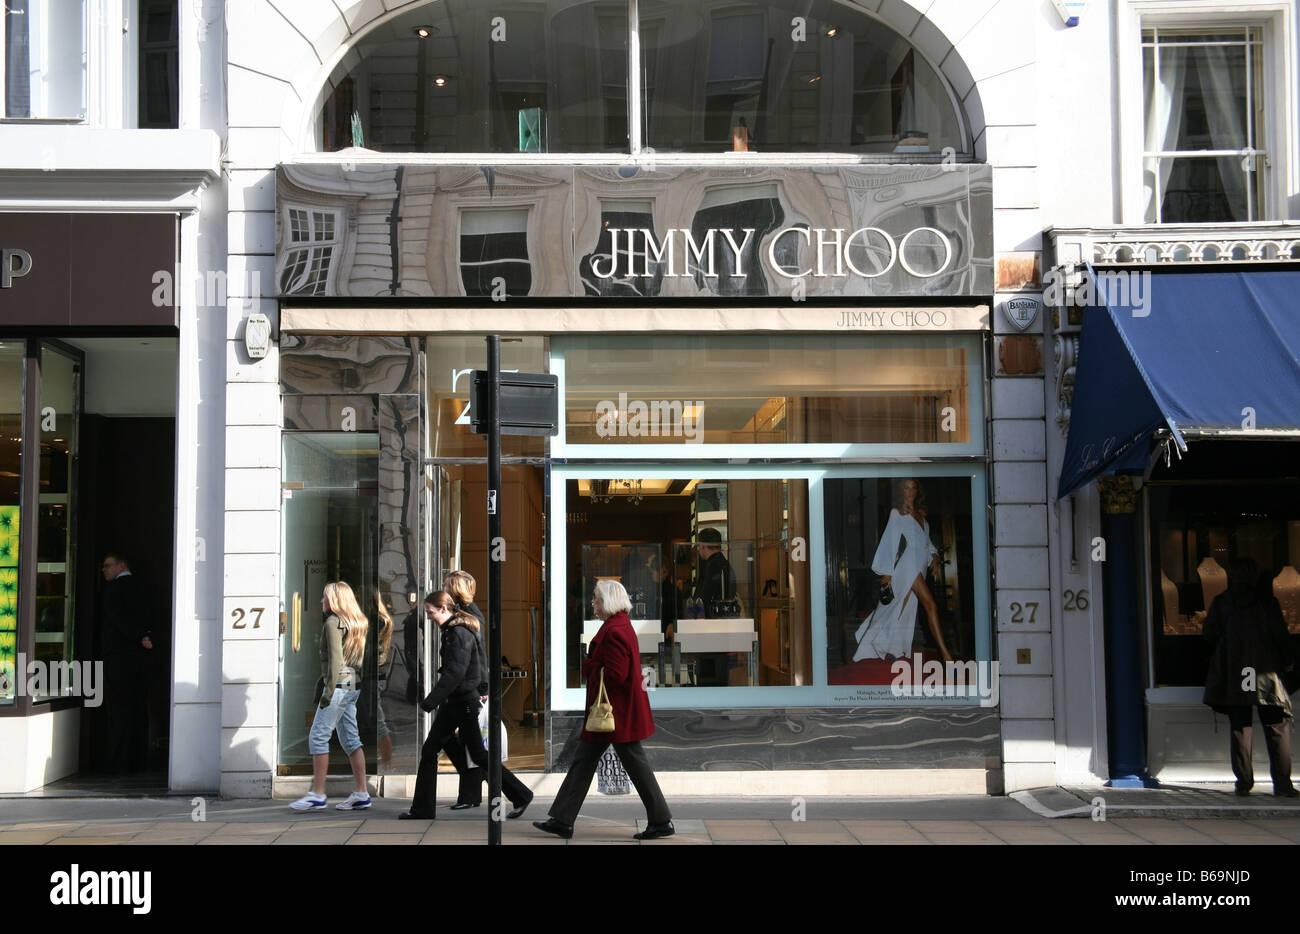 99417a38581 Jimmy Choo shop, New Bond Street, London Stock Photo: 21112853 - Alamy